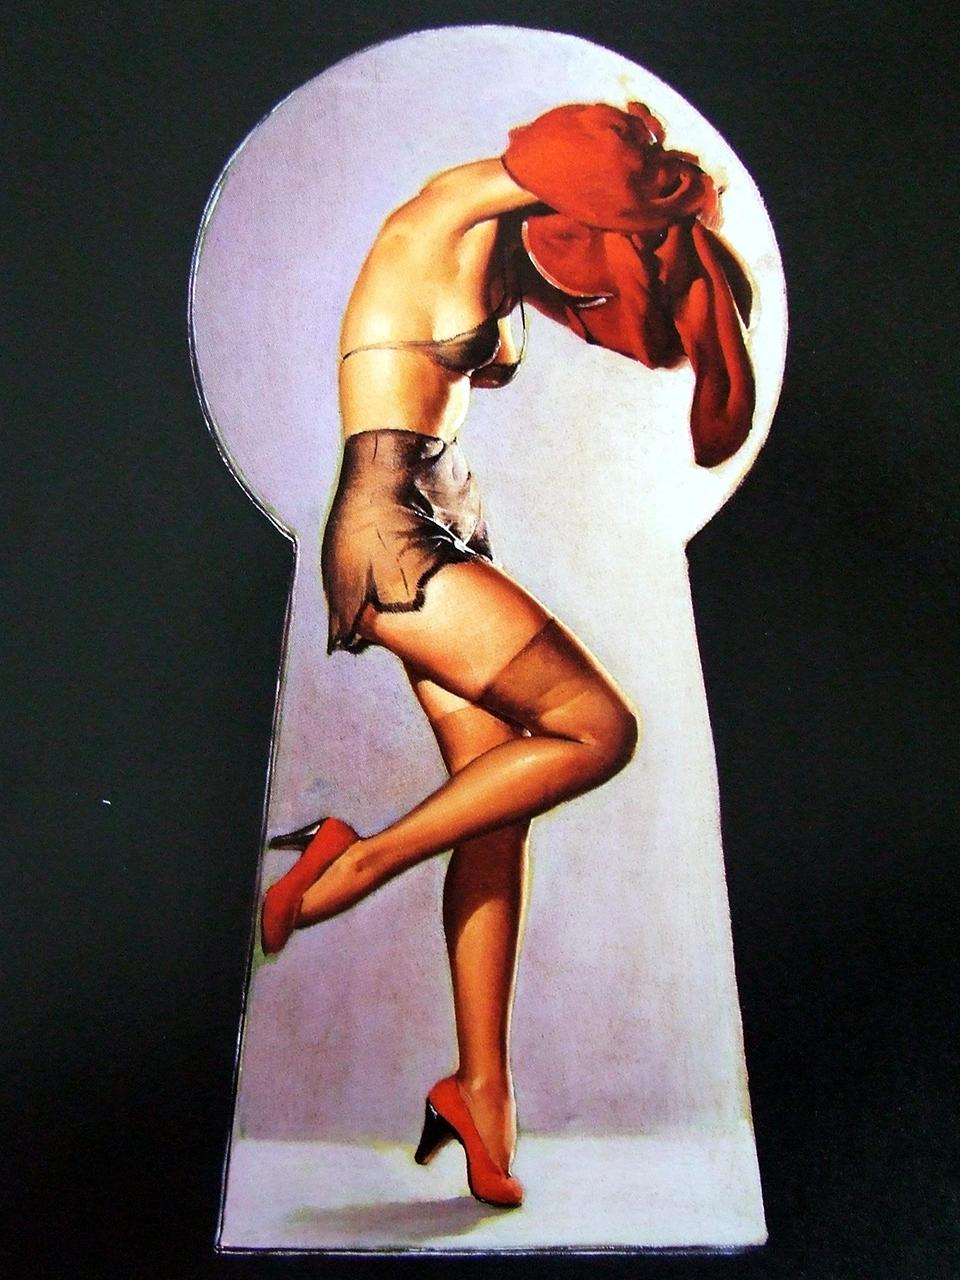 Постер на подрамнике Джил Элвгрен: Peek a view